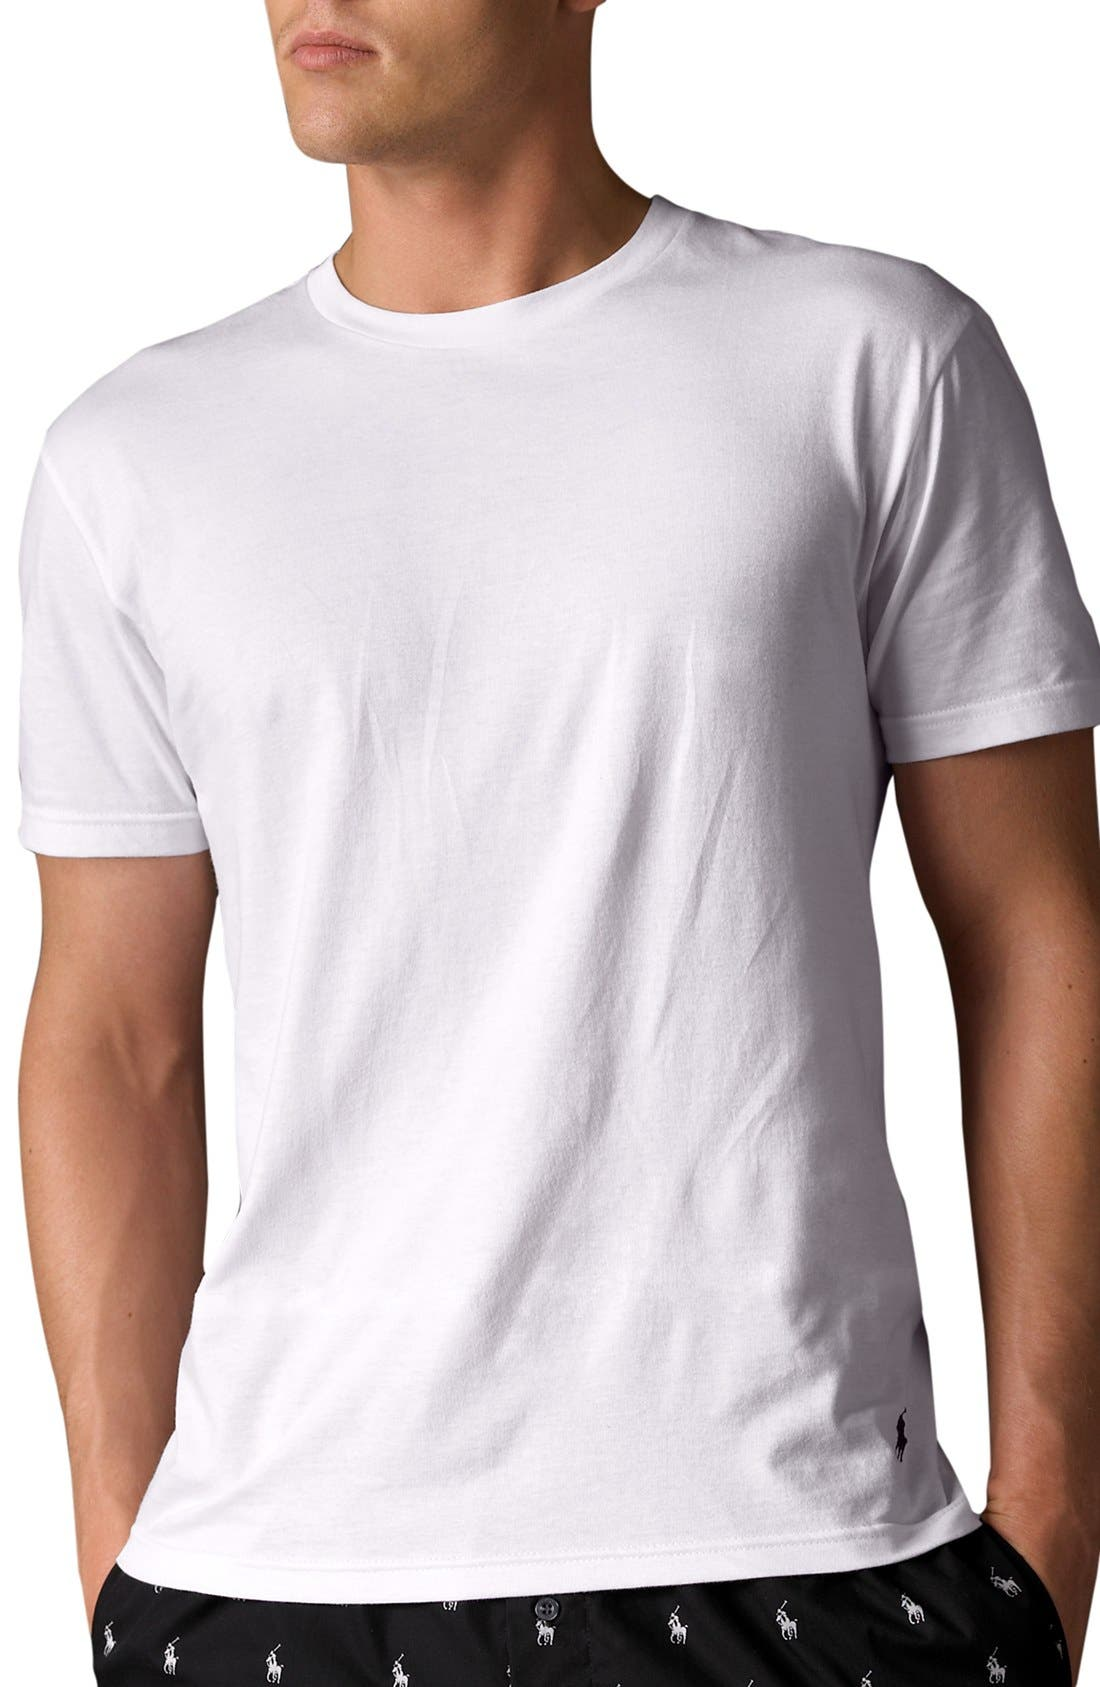 Alternate Image 1 Selected - Polo Ralph Lauren 2-Pack Crewneck T-Shirt (Tall)